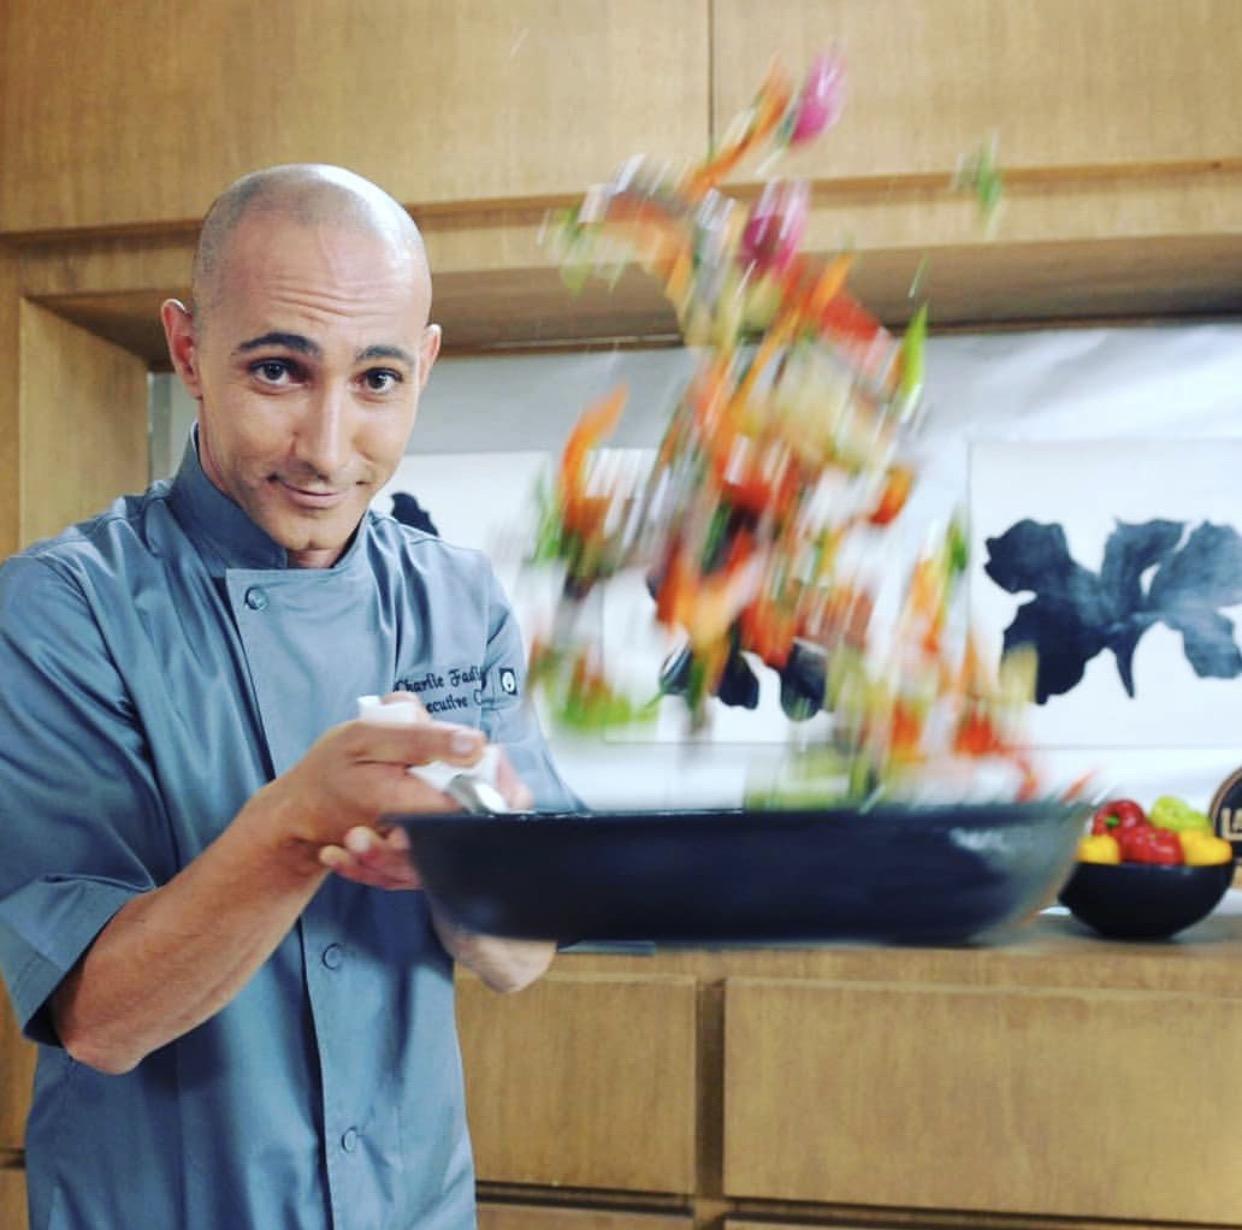 chef_charliefadida@ - שף צ׳רלי פדידה